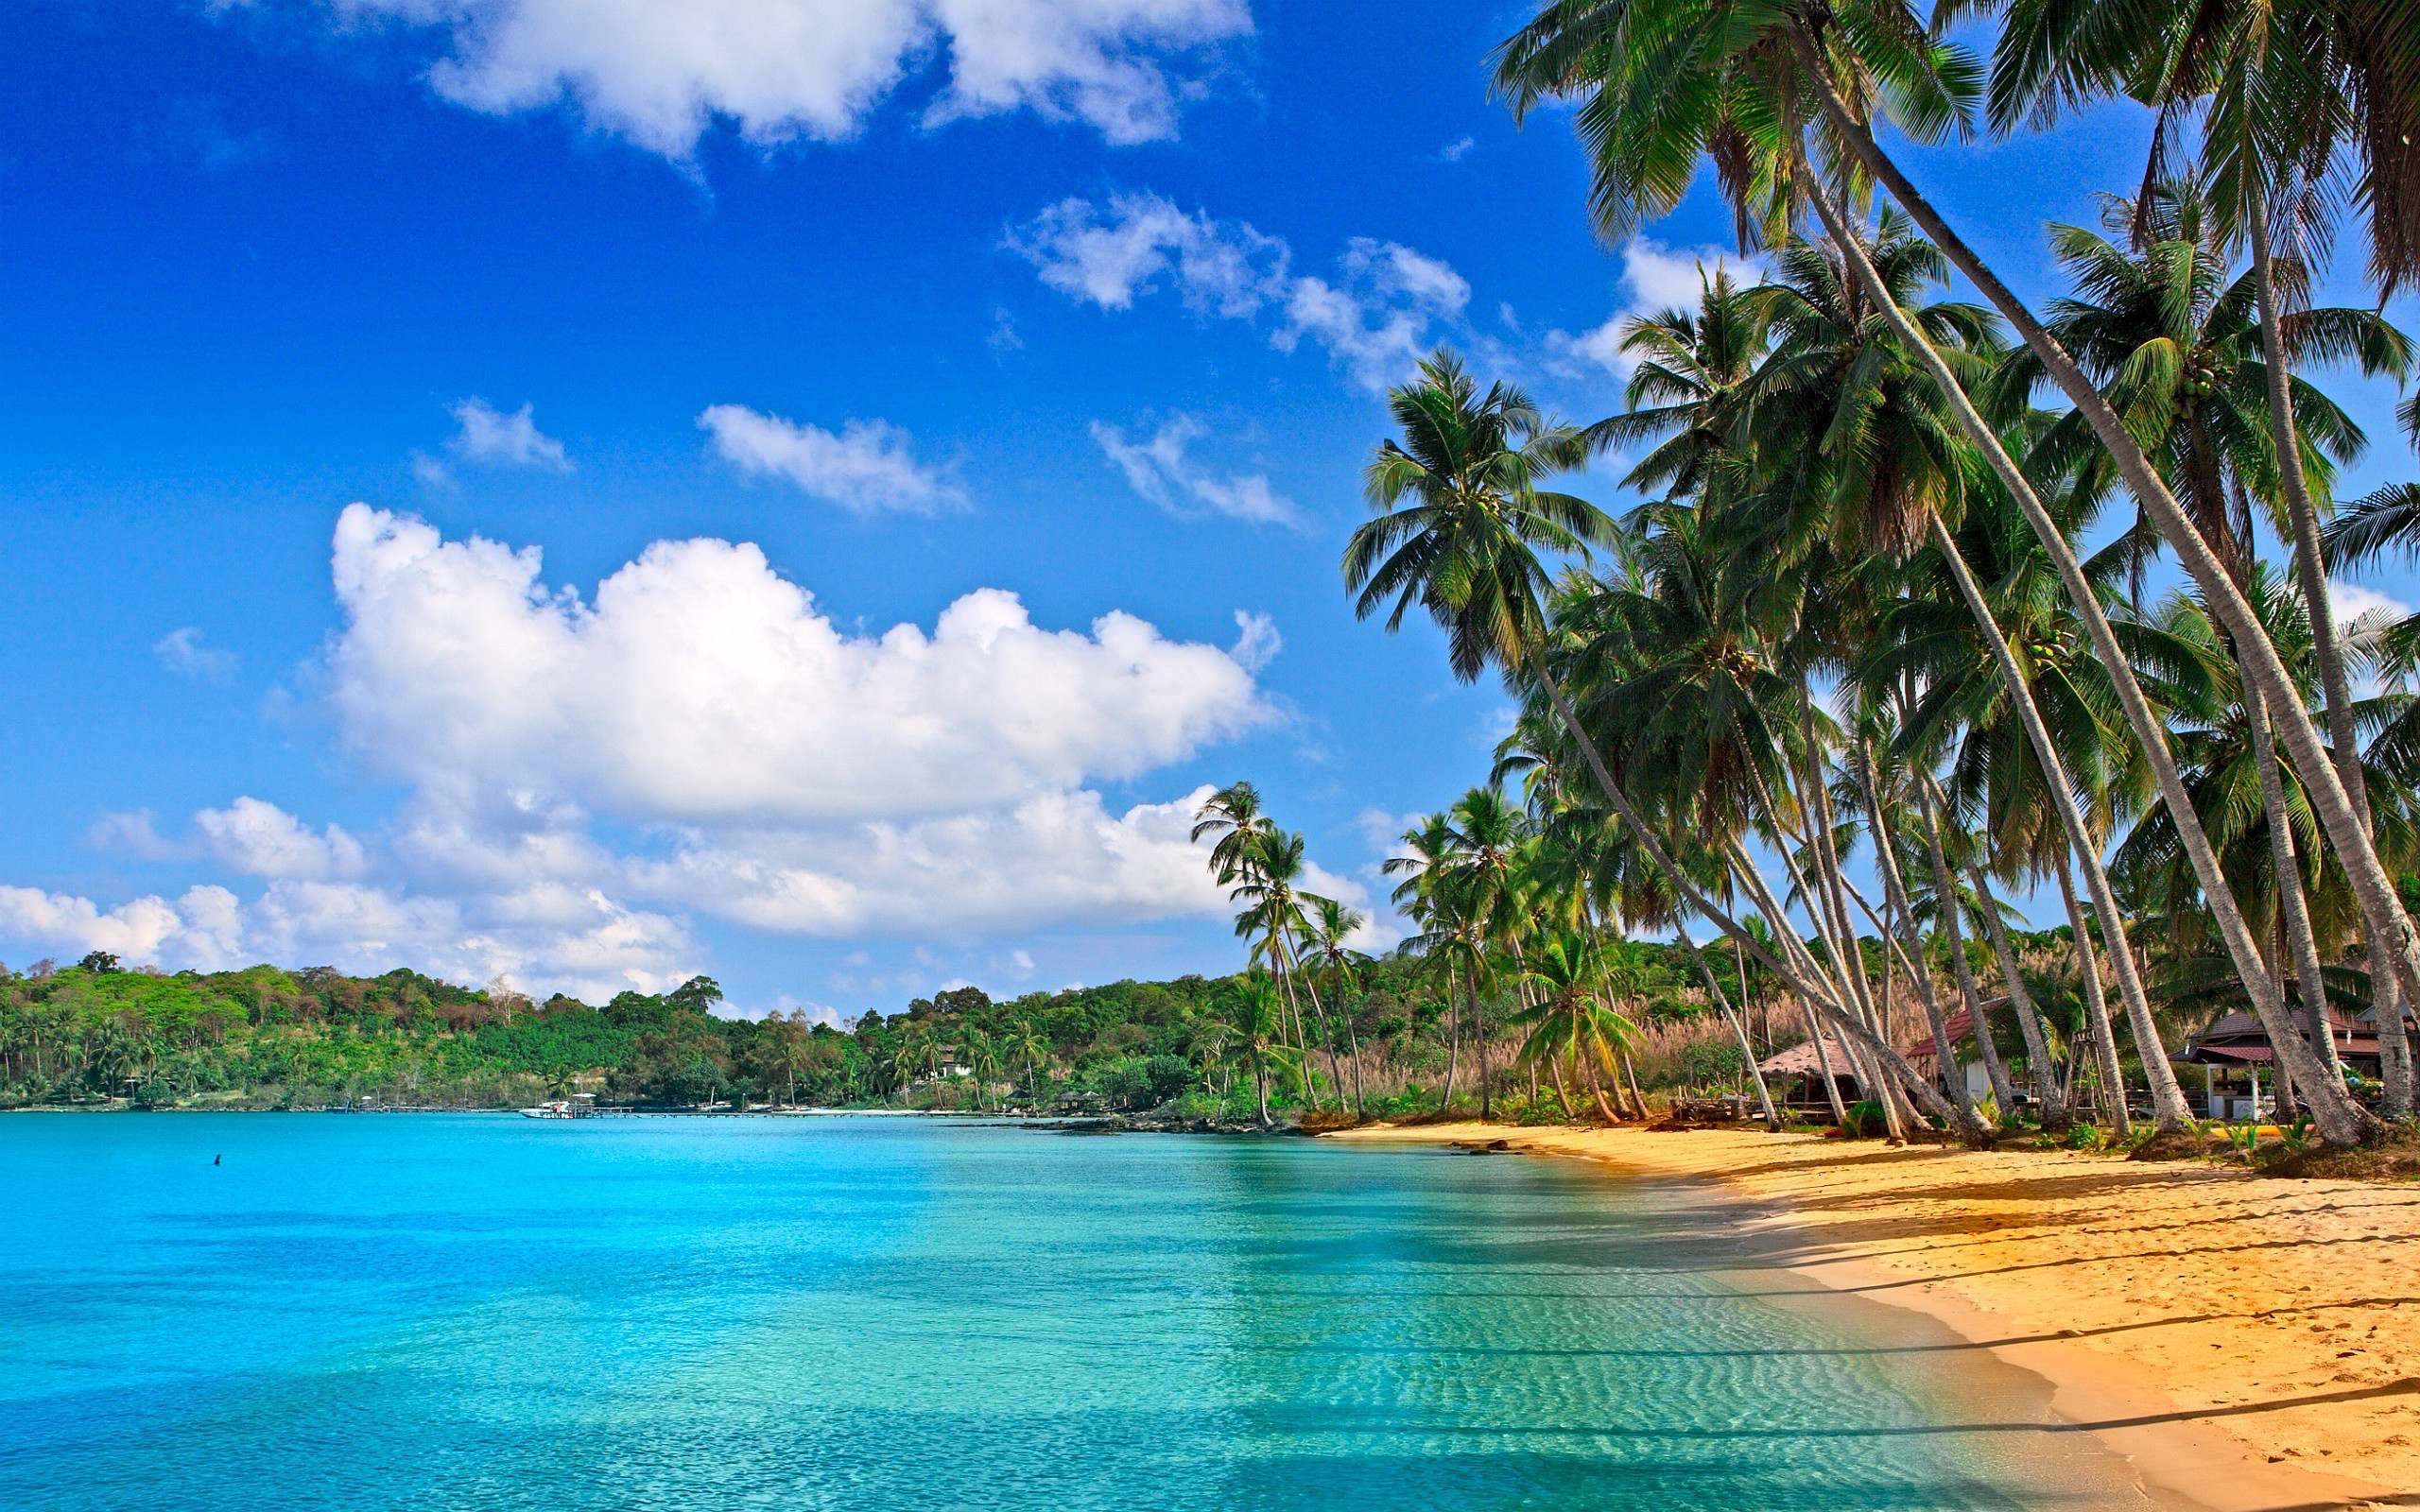 tropical beach wallpapers hd